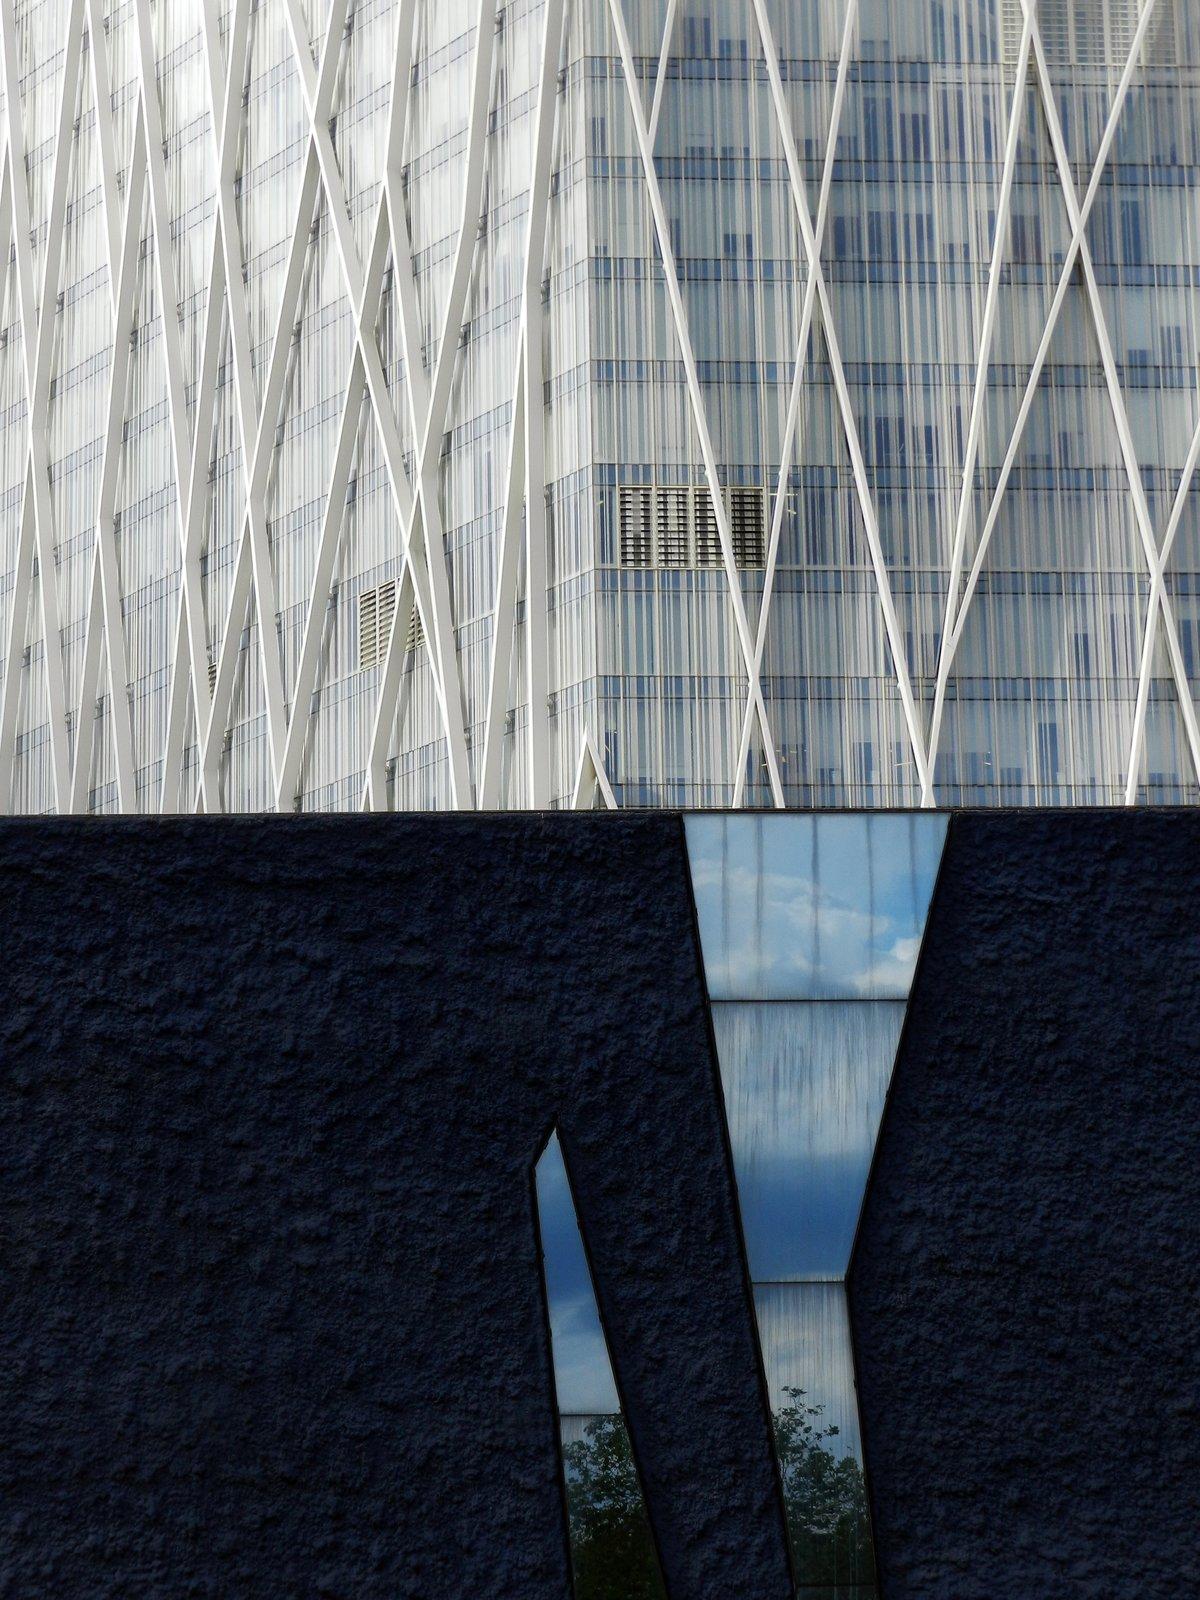 Mirror Facade.  Photo 13 of 16 in Nikola Olic's Dizzying Architectural Photography